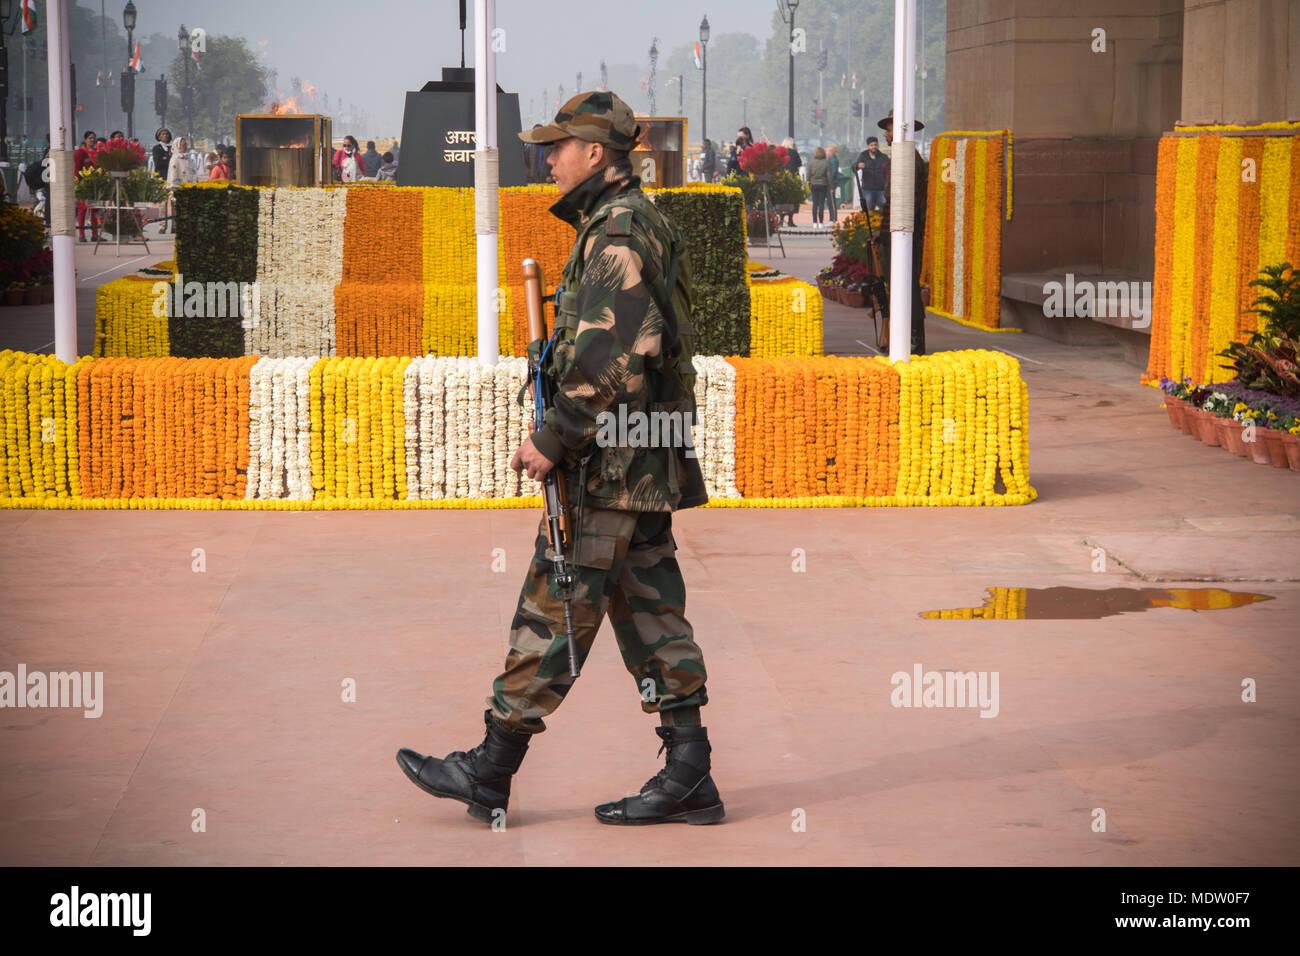 Amar jawan stock photos amar jawan stock images alamy new delhi india january 27 2018 soldiers standing at amar jawan memorial thecheapjerseys Images